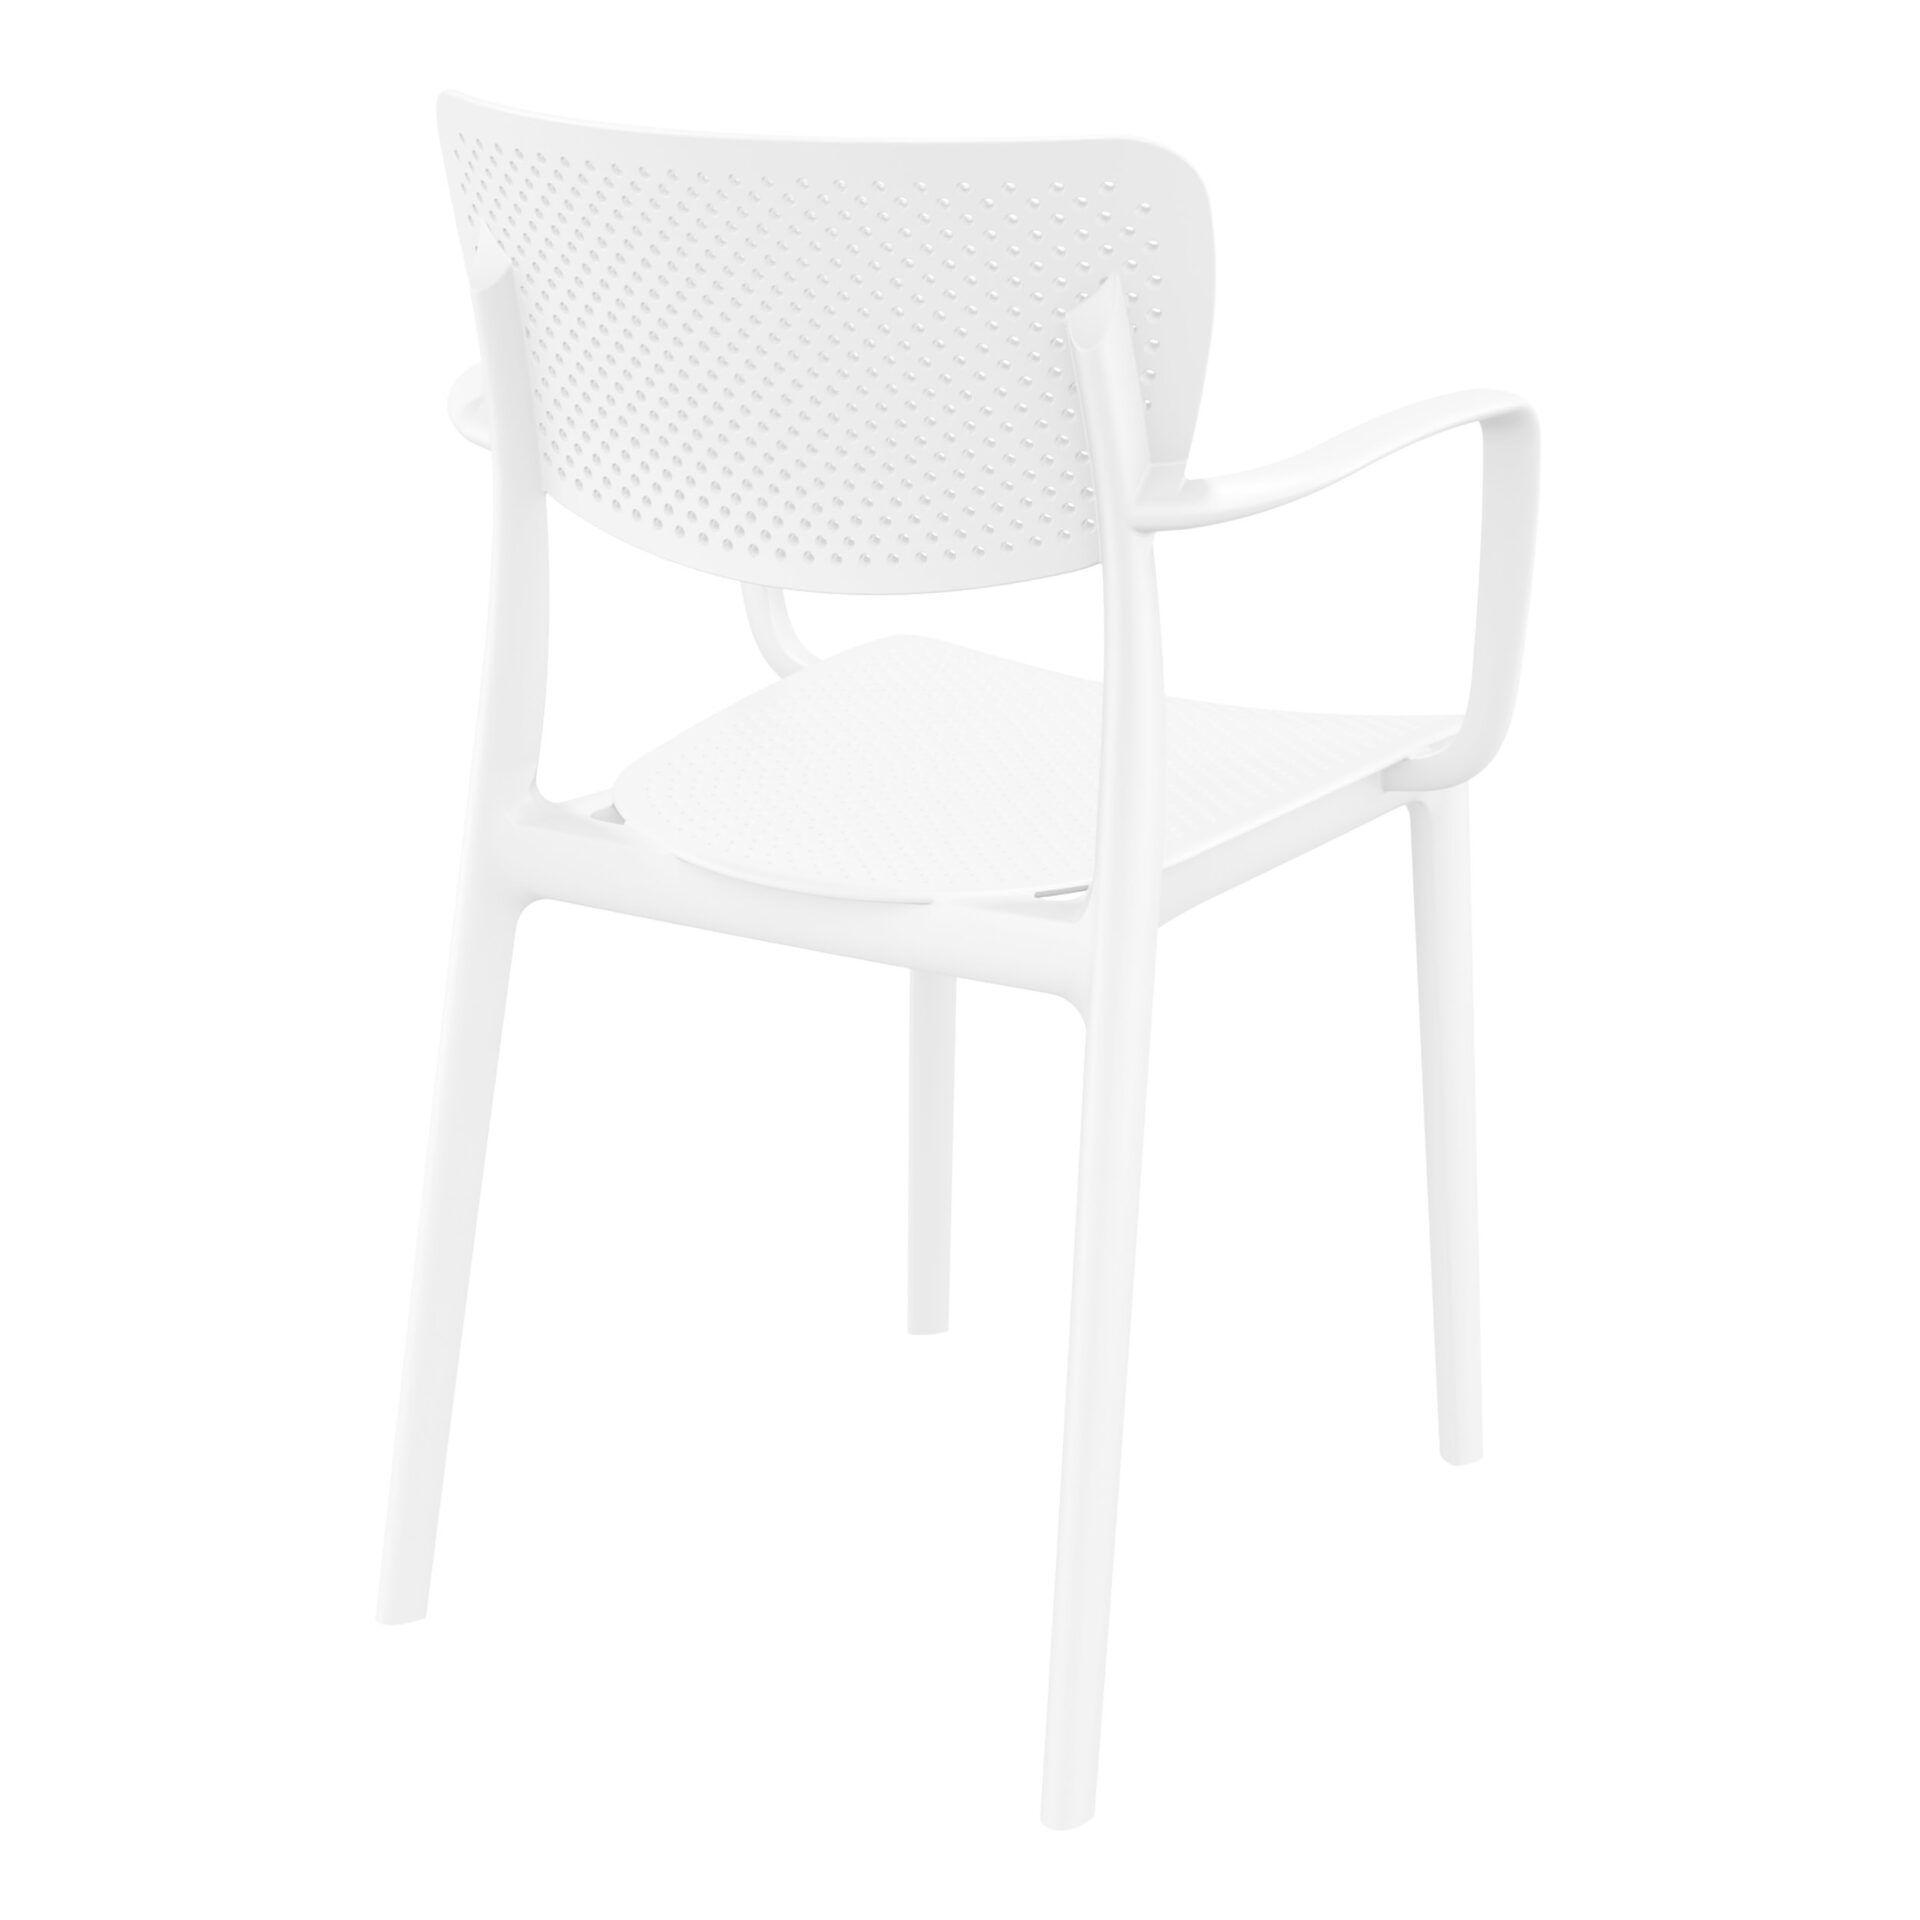 polypropylene hospitality seating loft armchair white back side